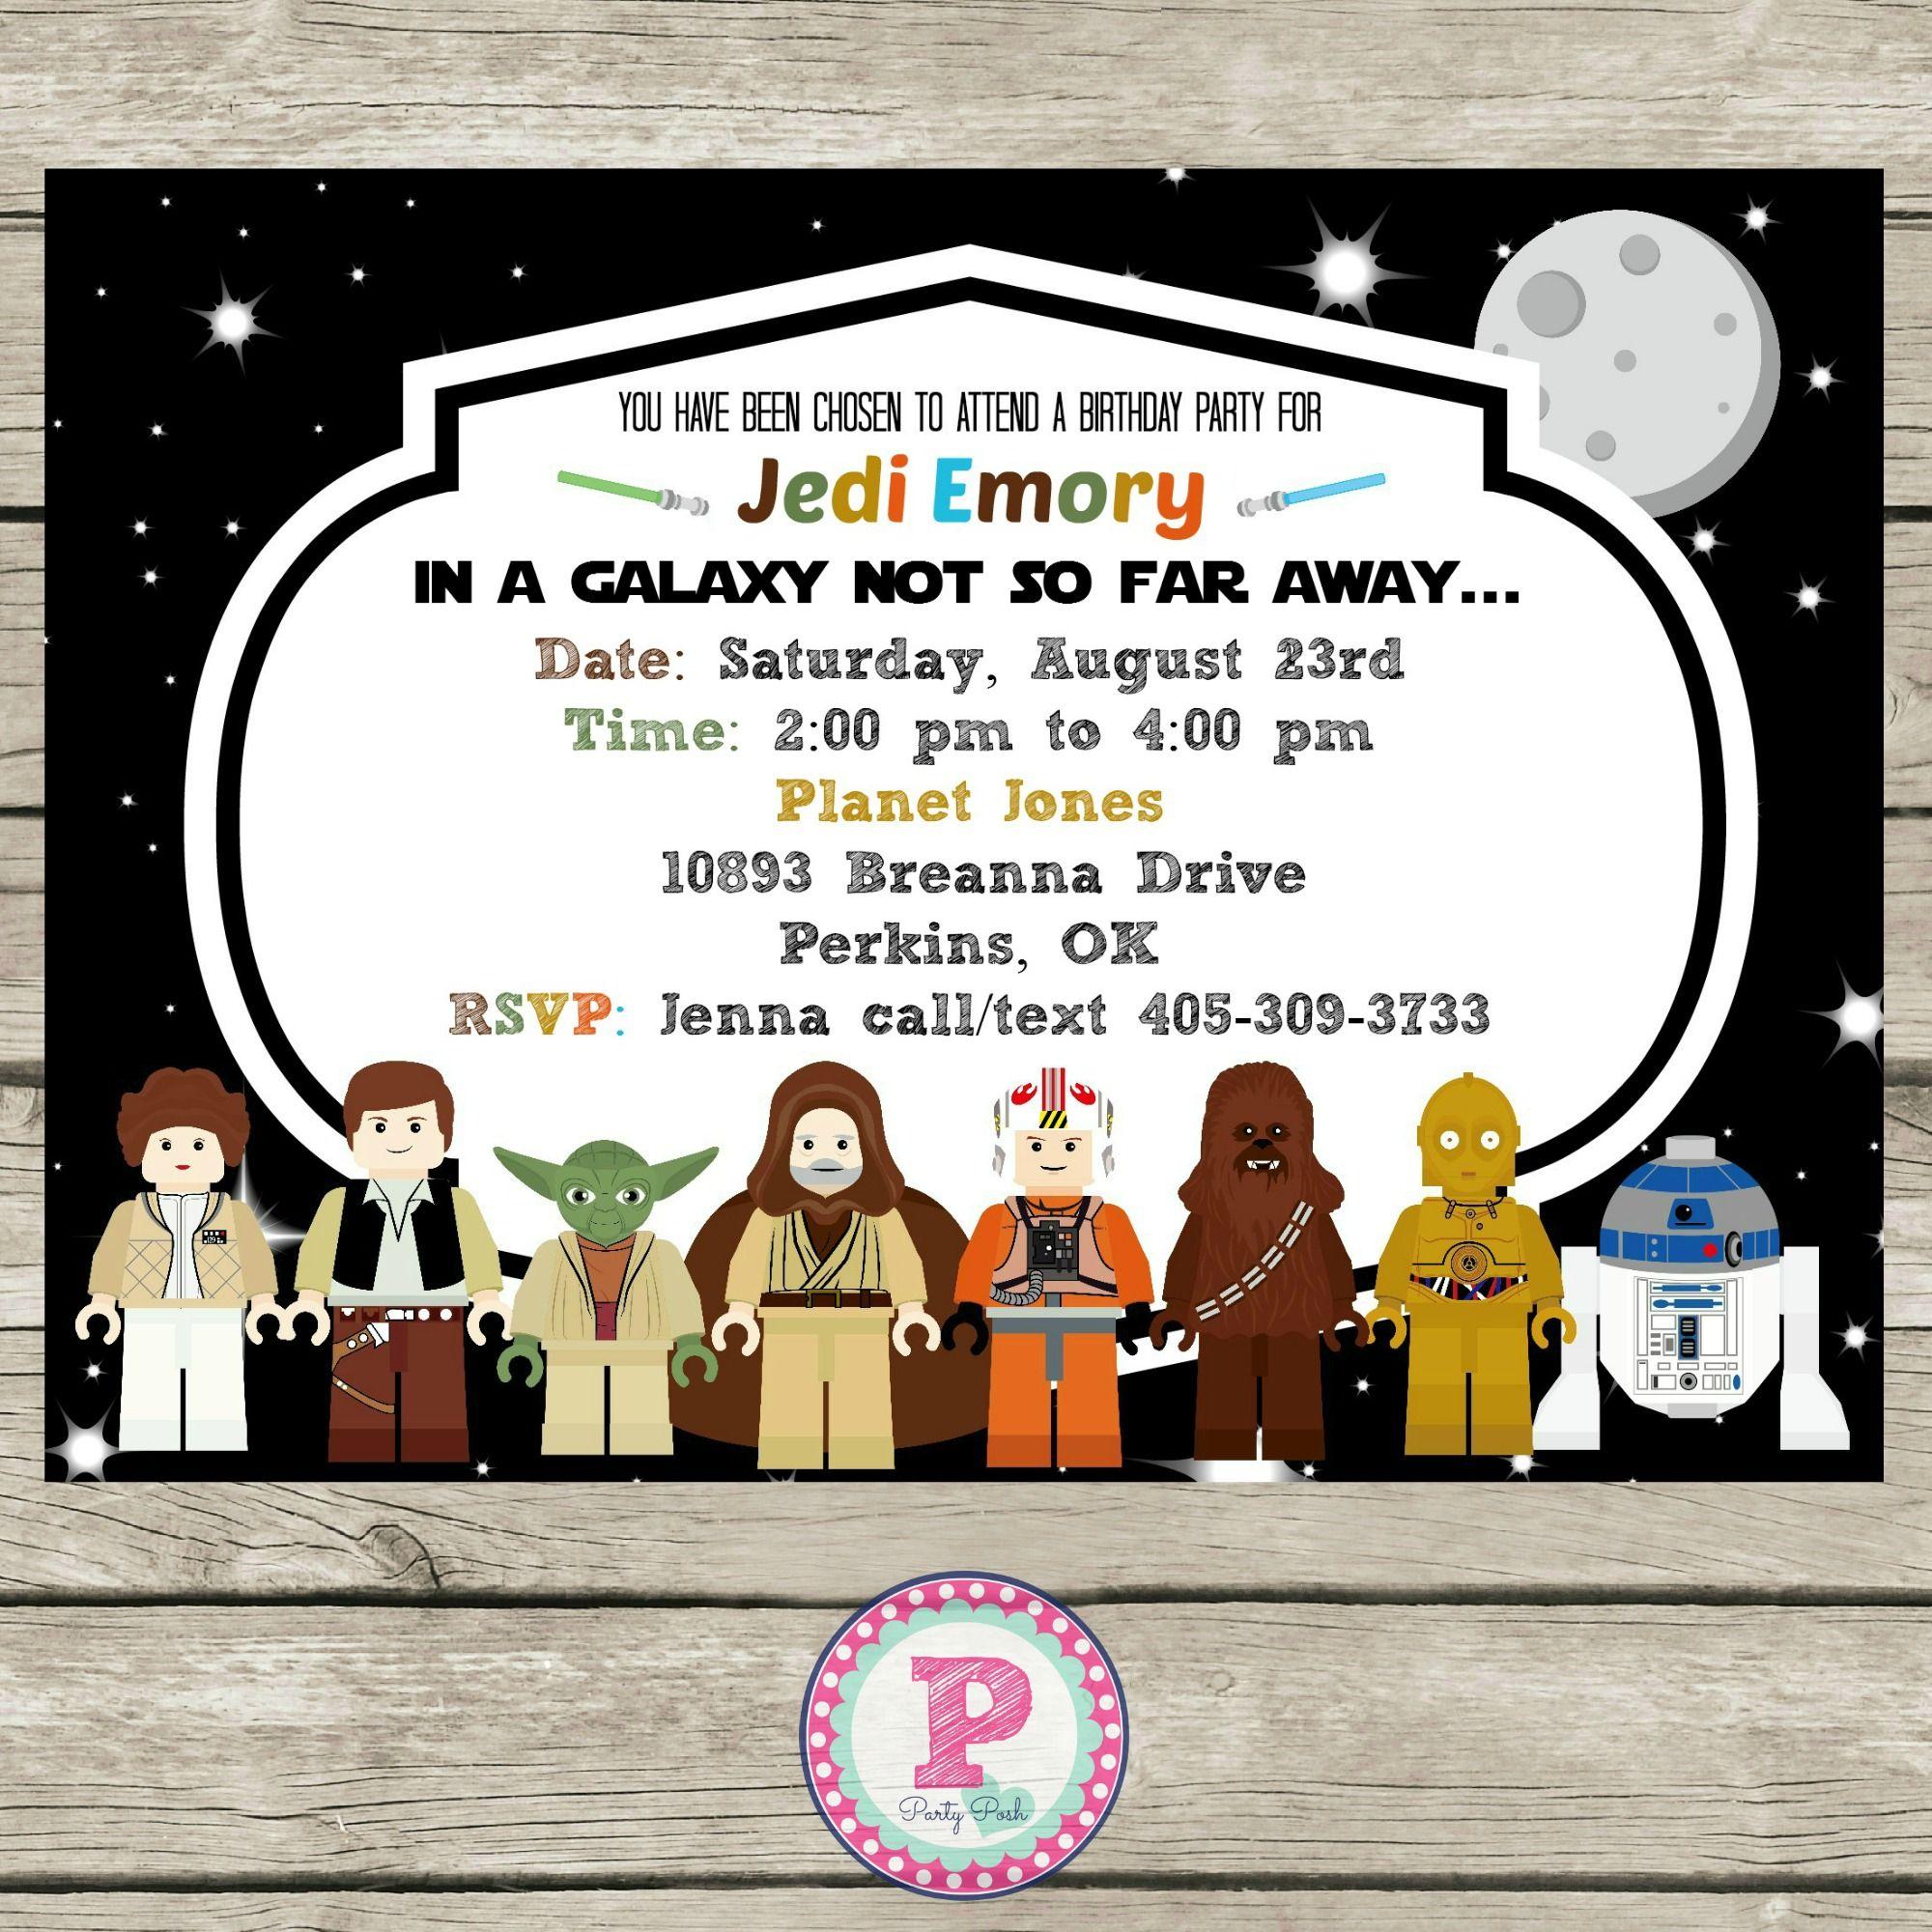 Lego Star Wars Birthday Party Invitation | Star Wars Party Ideas ...